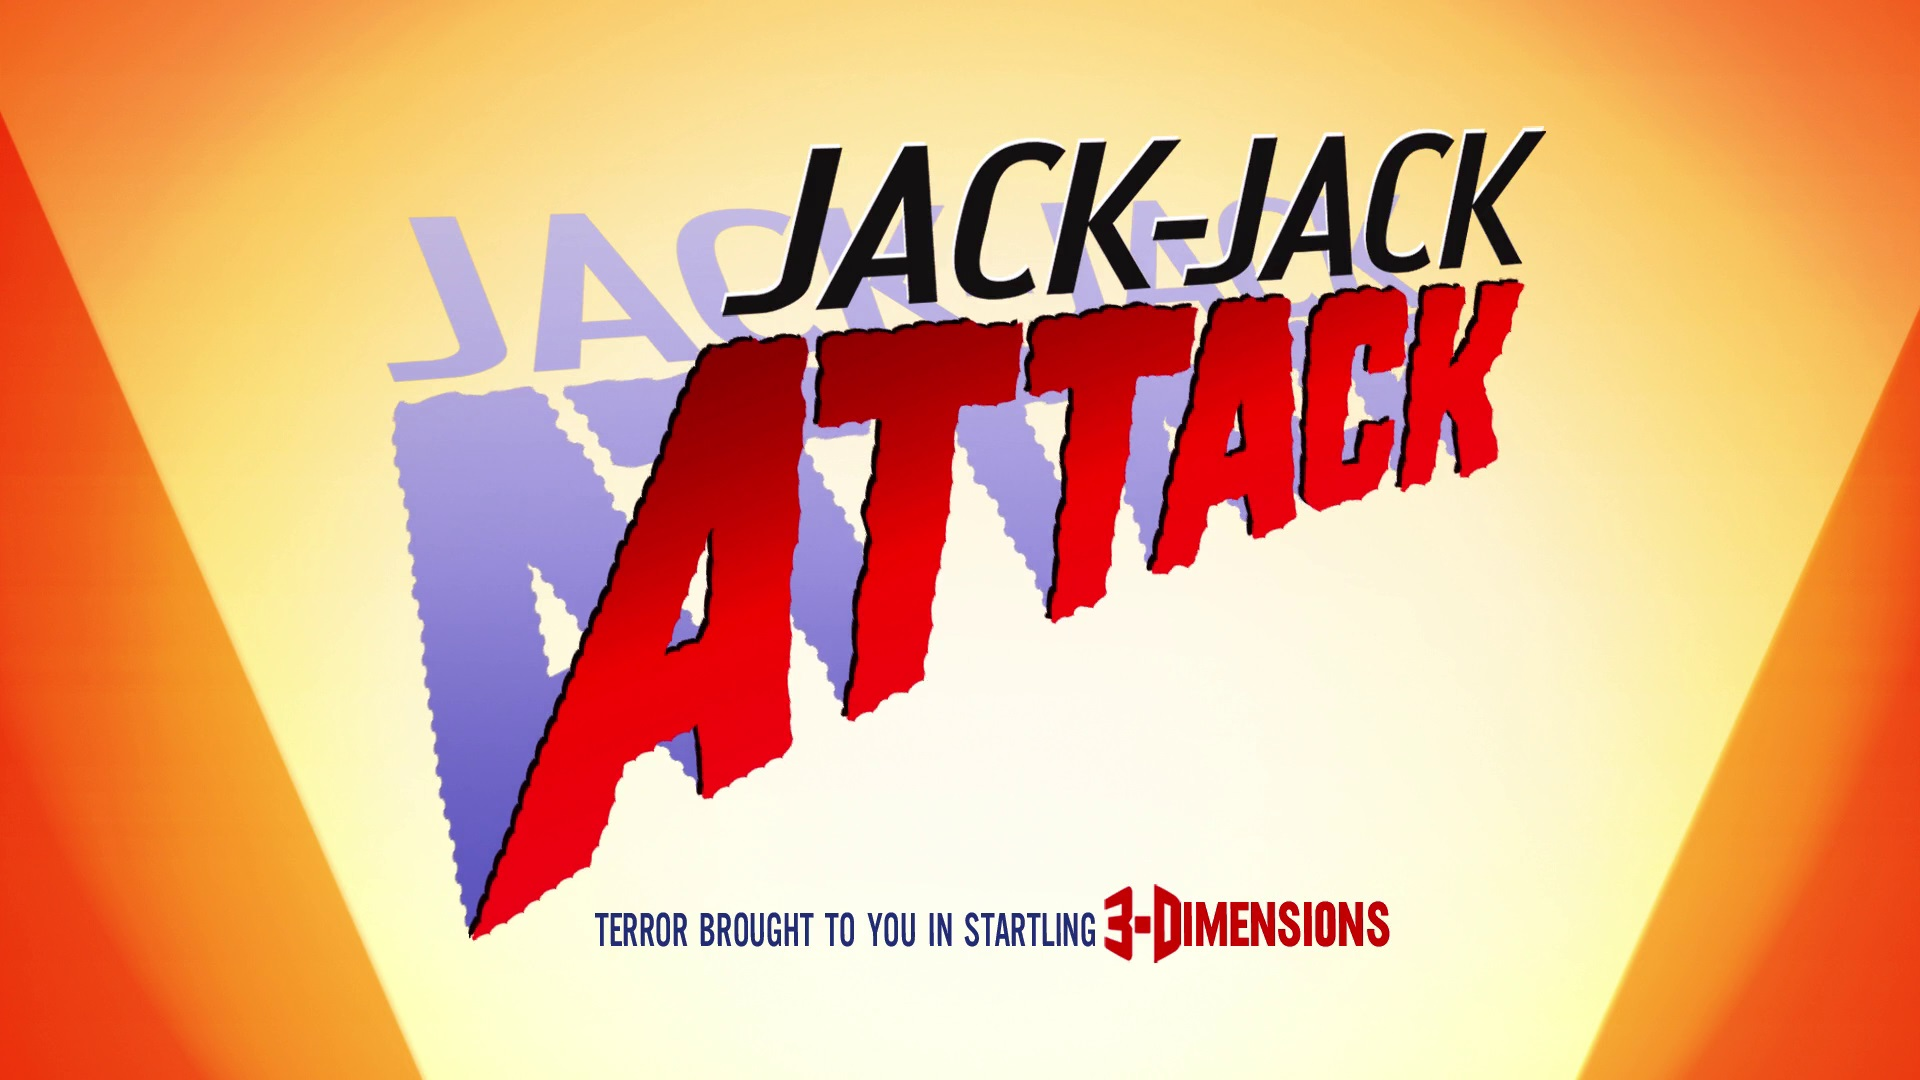 Arquivo:Title-jackjackattack.jpg